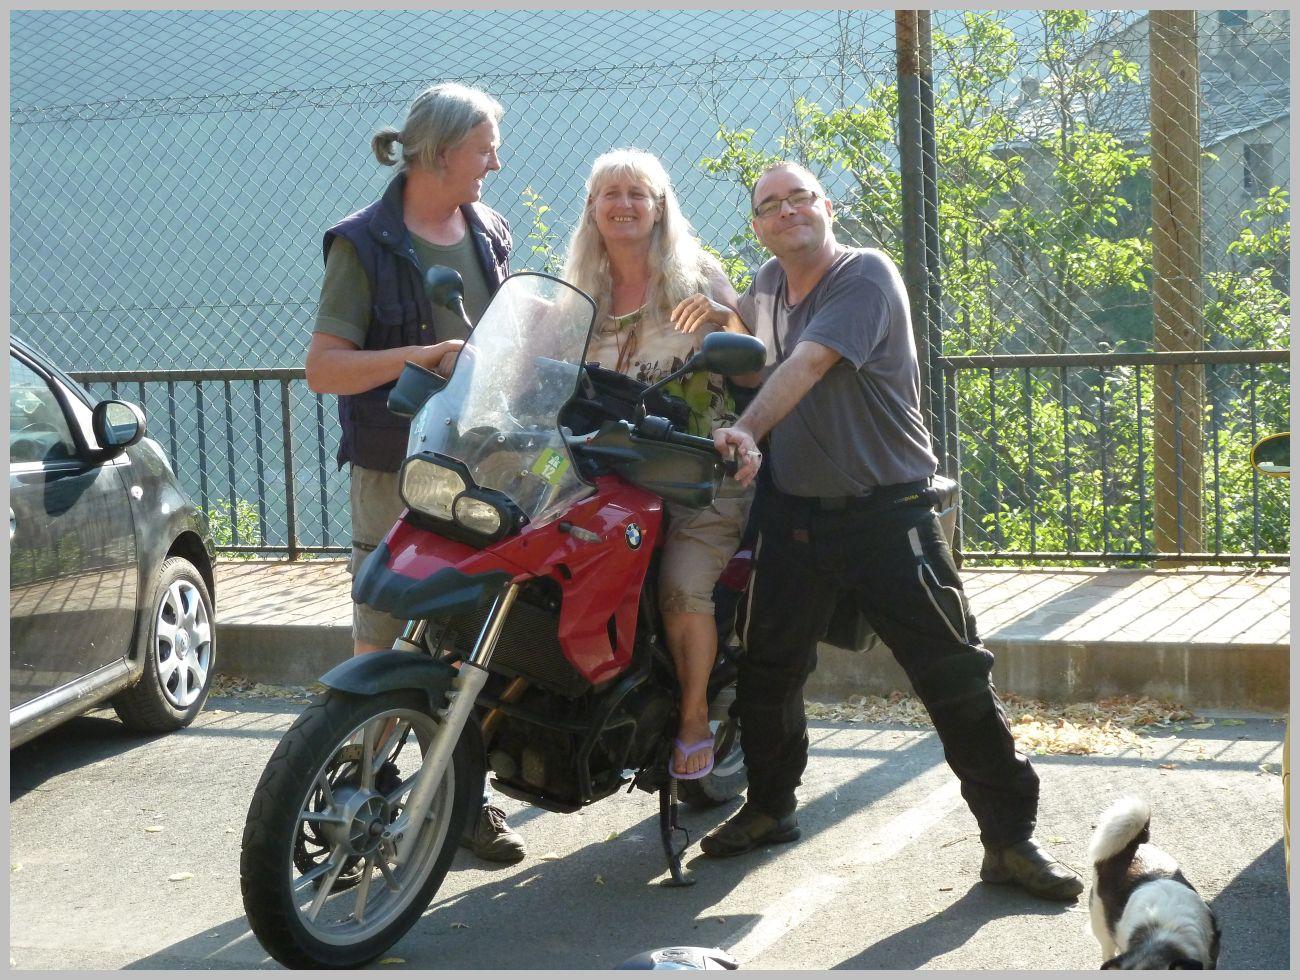 201206_Korsika_Moped062